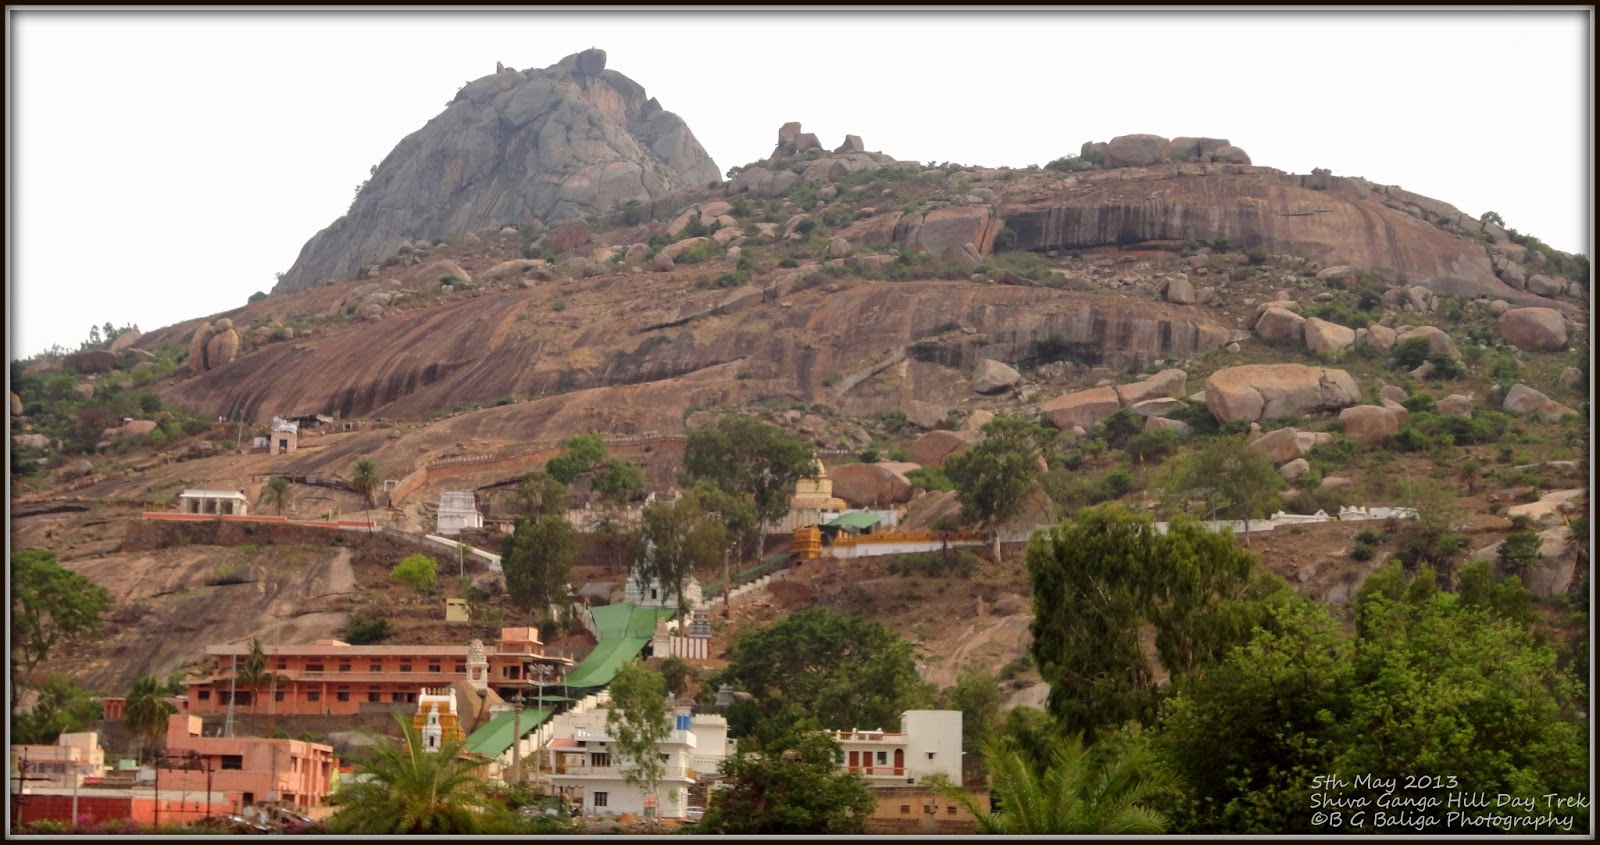 Shiva Ganga Hills: A Trek to remember - Bangalore Trekking Club®